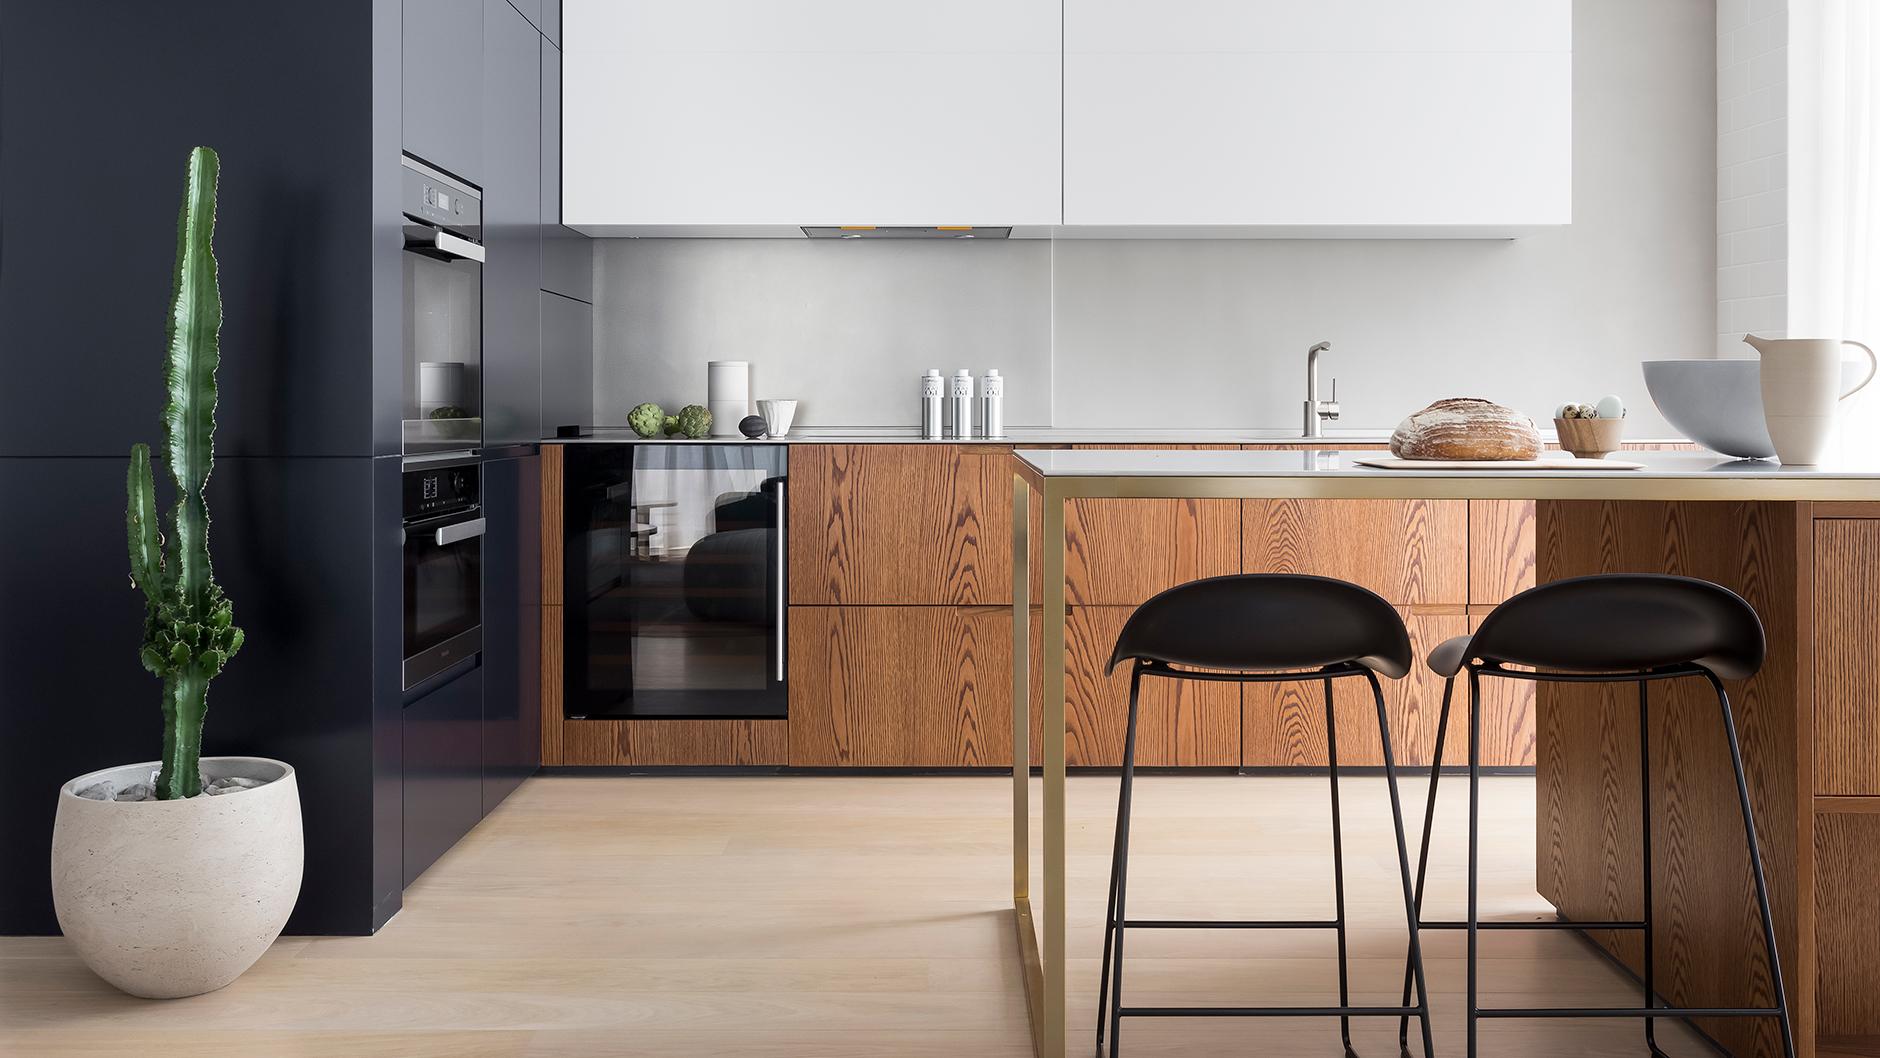 Interior Design Barts Square Askew Building Kitchen